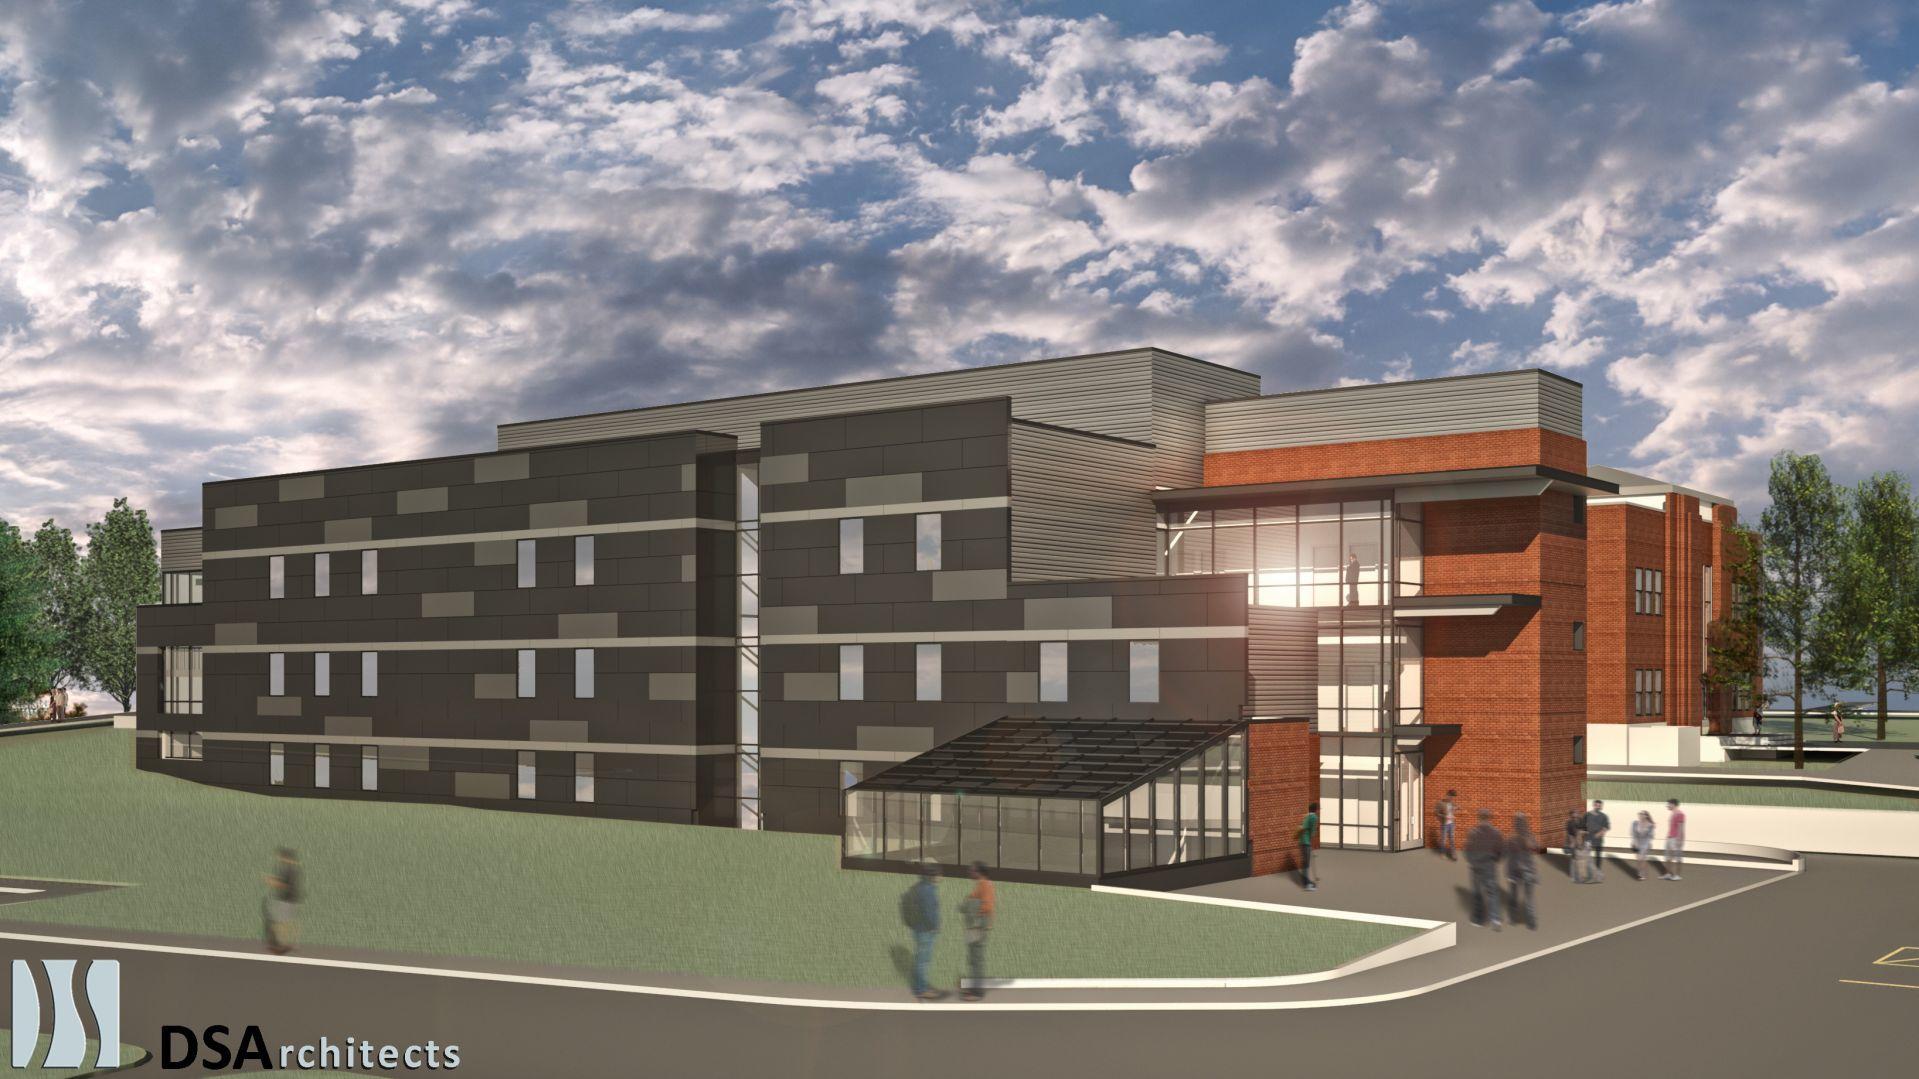 $5M raised for Montana State University Billings science building; groundbreaking set   Billings Gazette